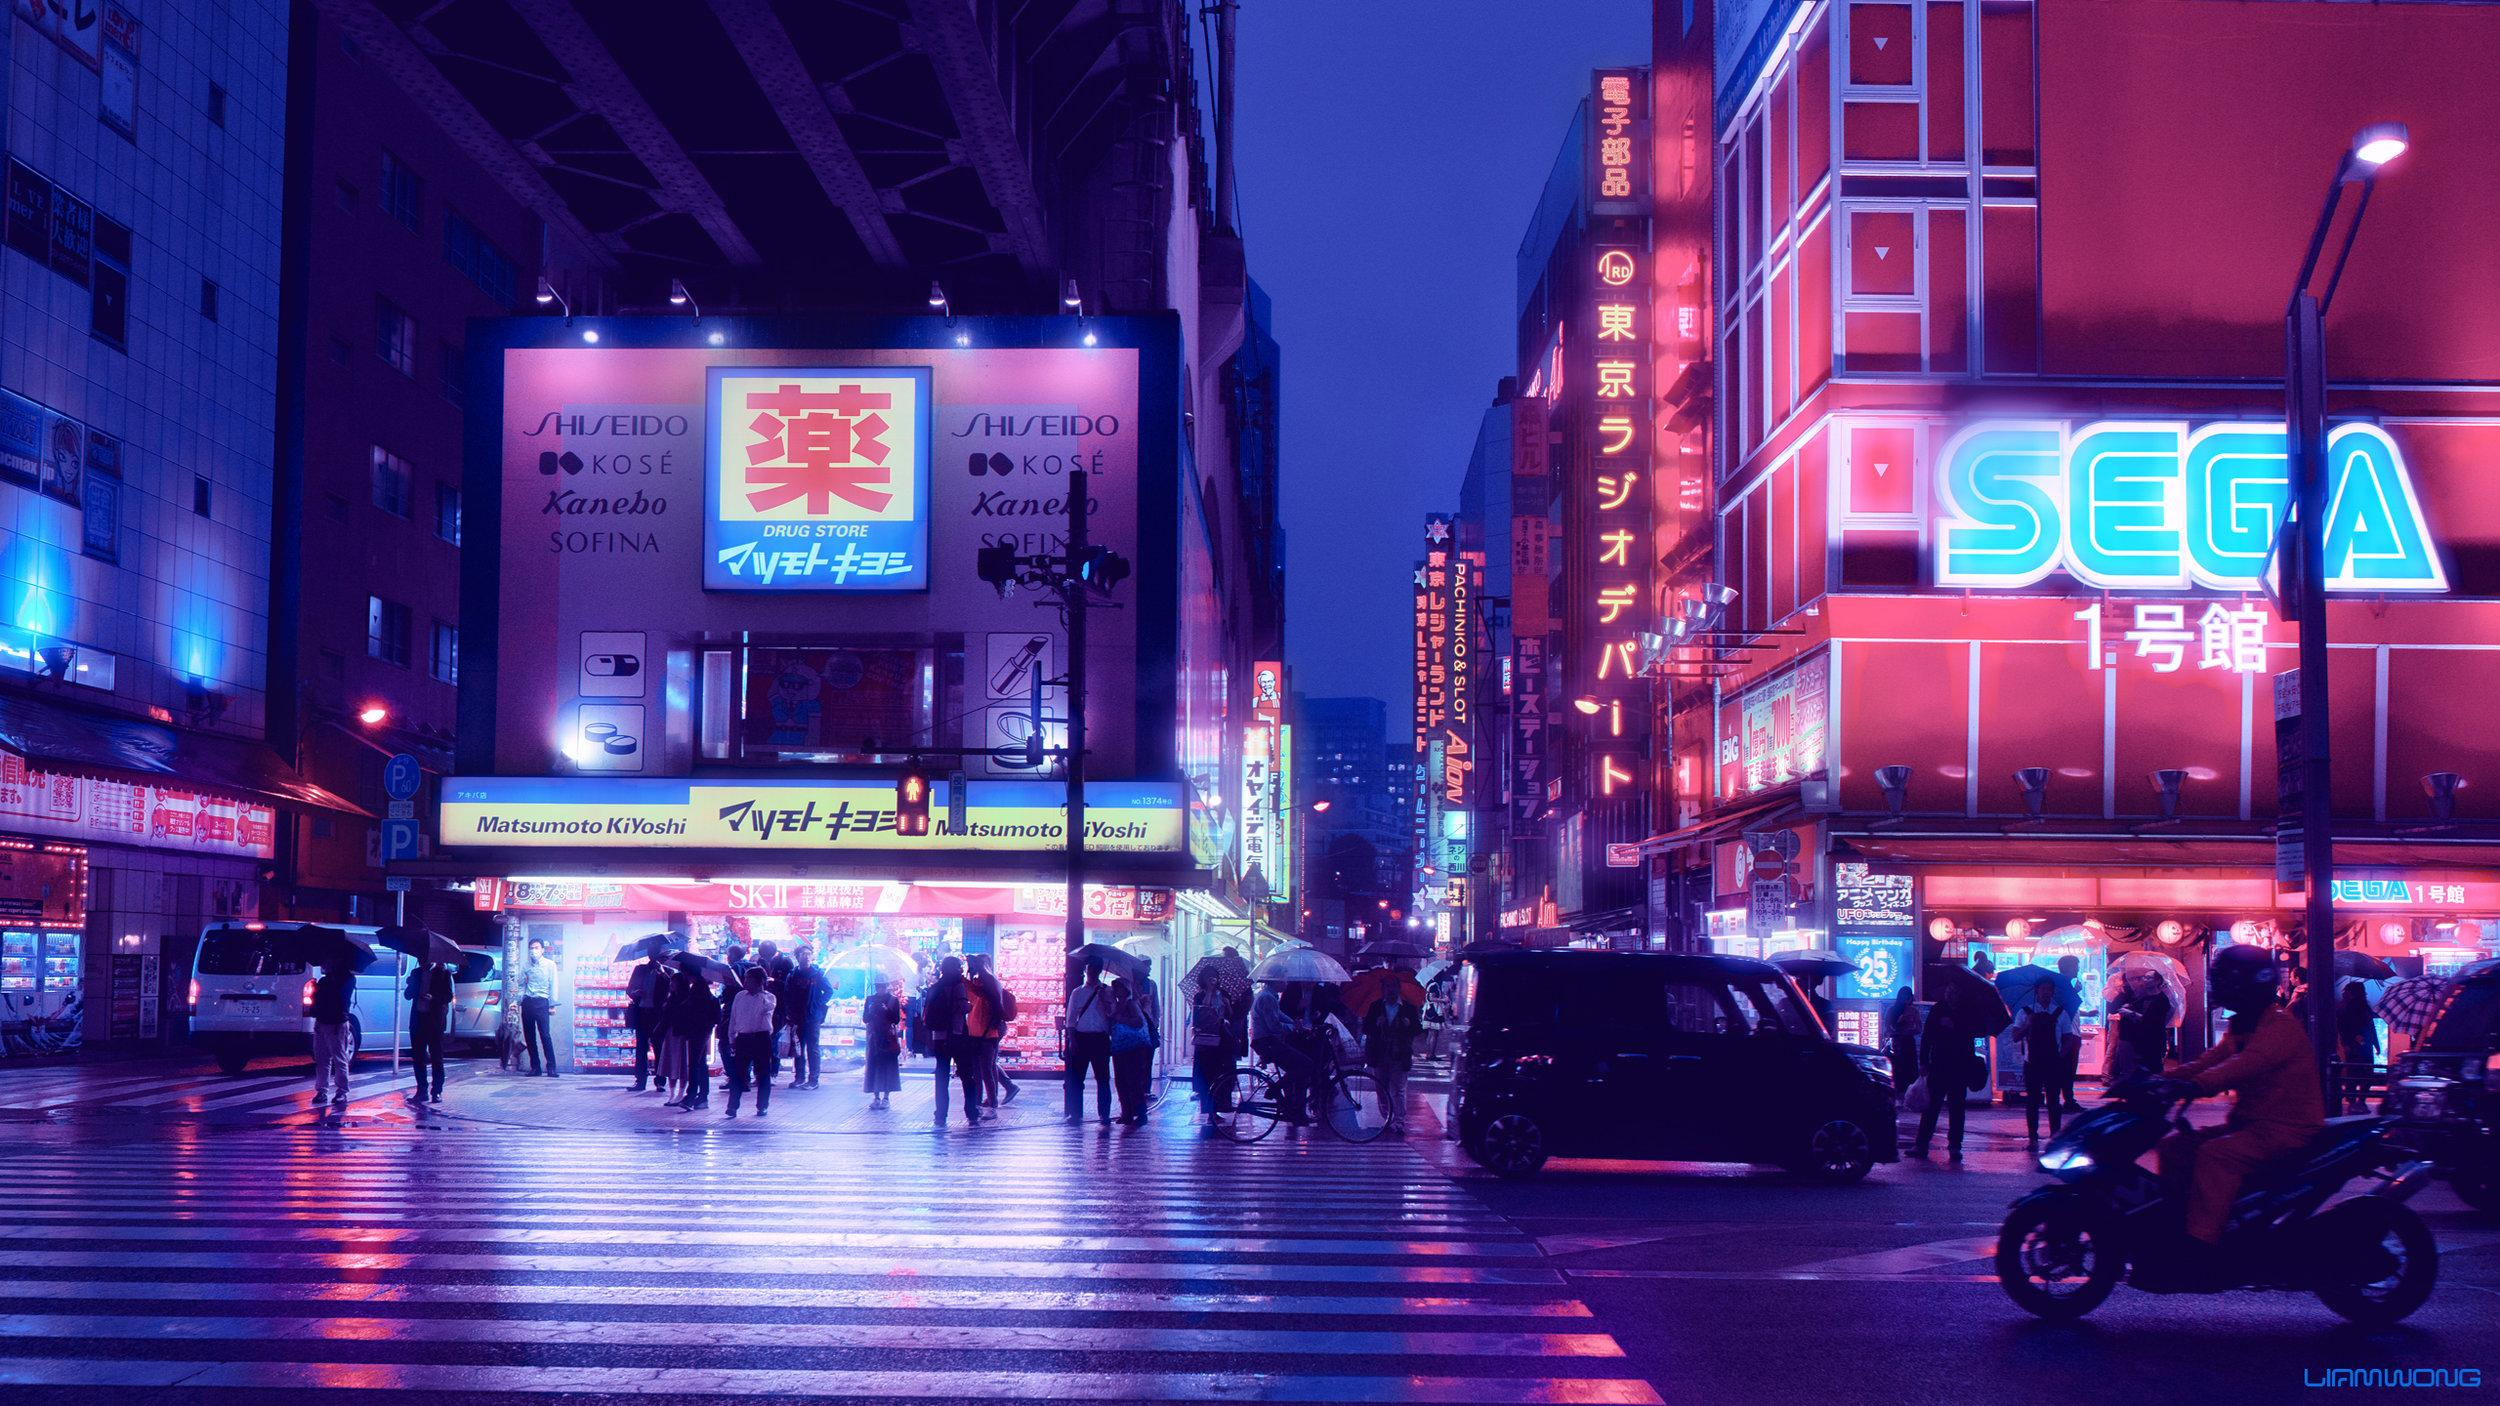 1080x1920 82+ purple phone wallpapers on wallpaperplay>. Aesthetic Japan Nightlife Wallpapers - Wallpaper Cave